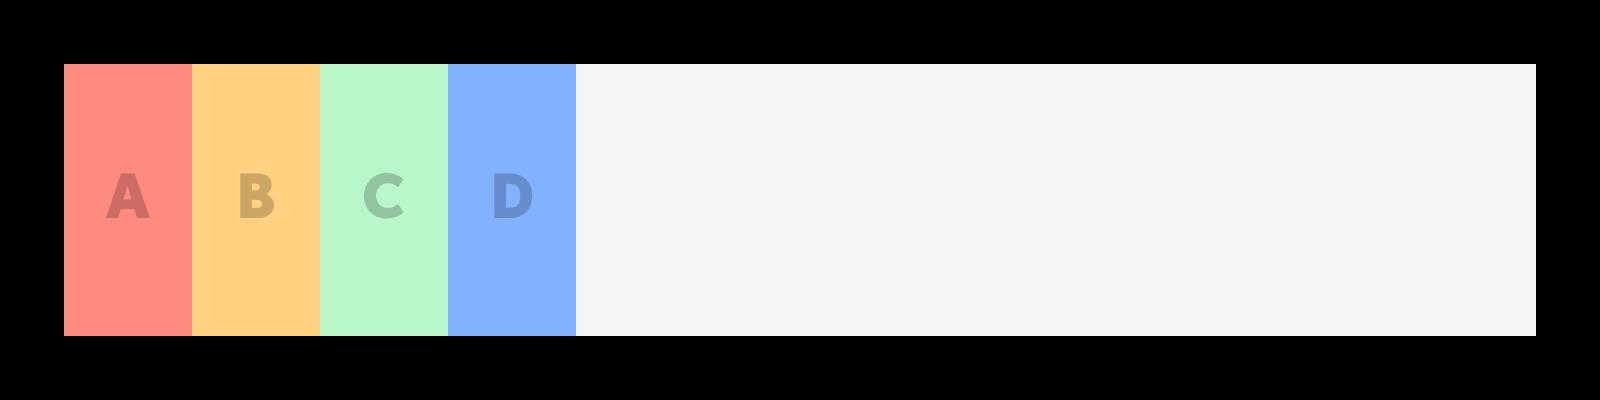 display_flex